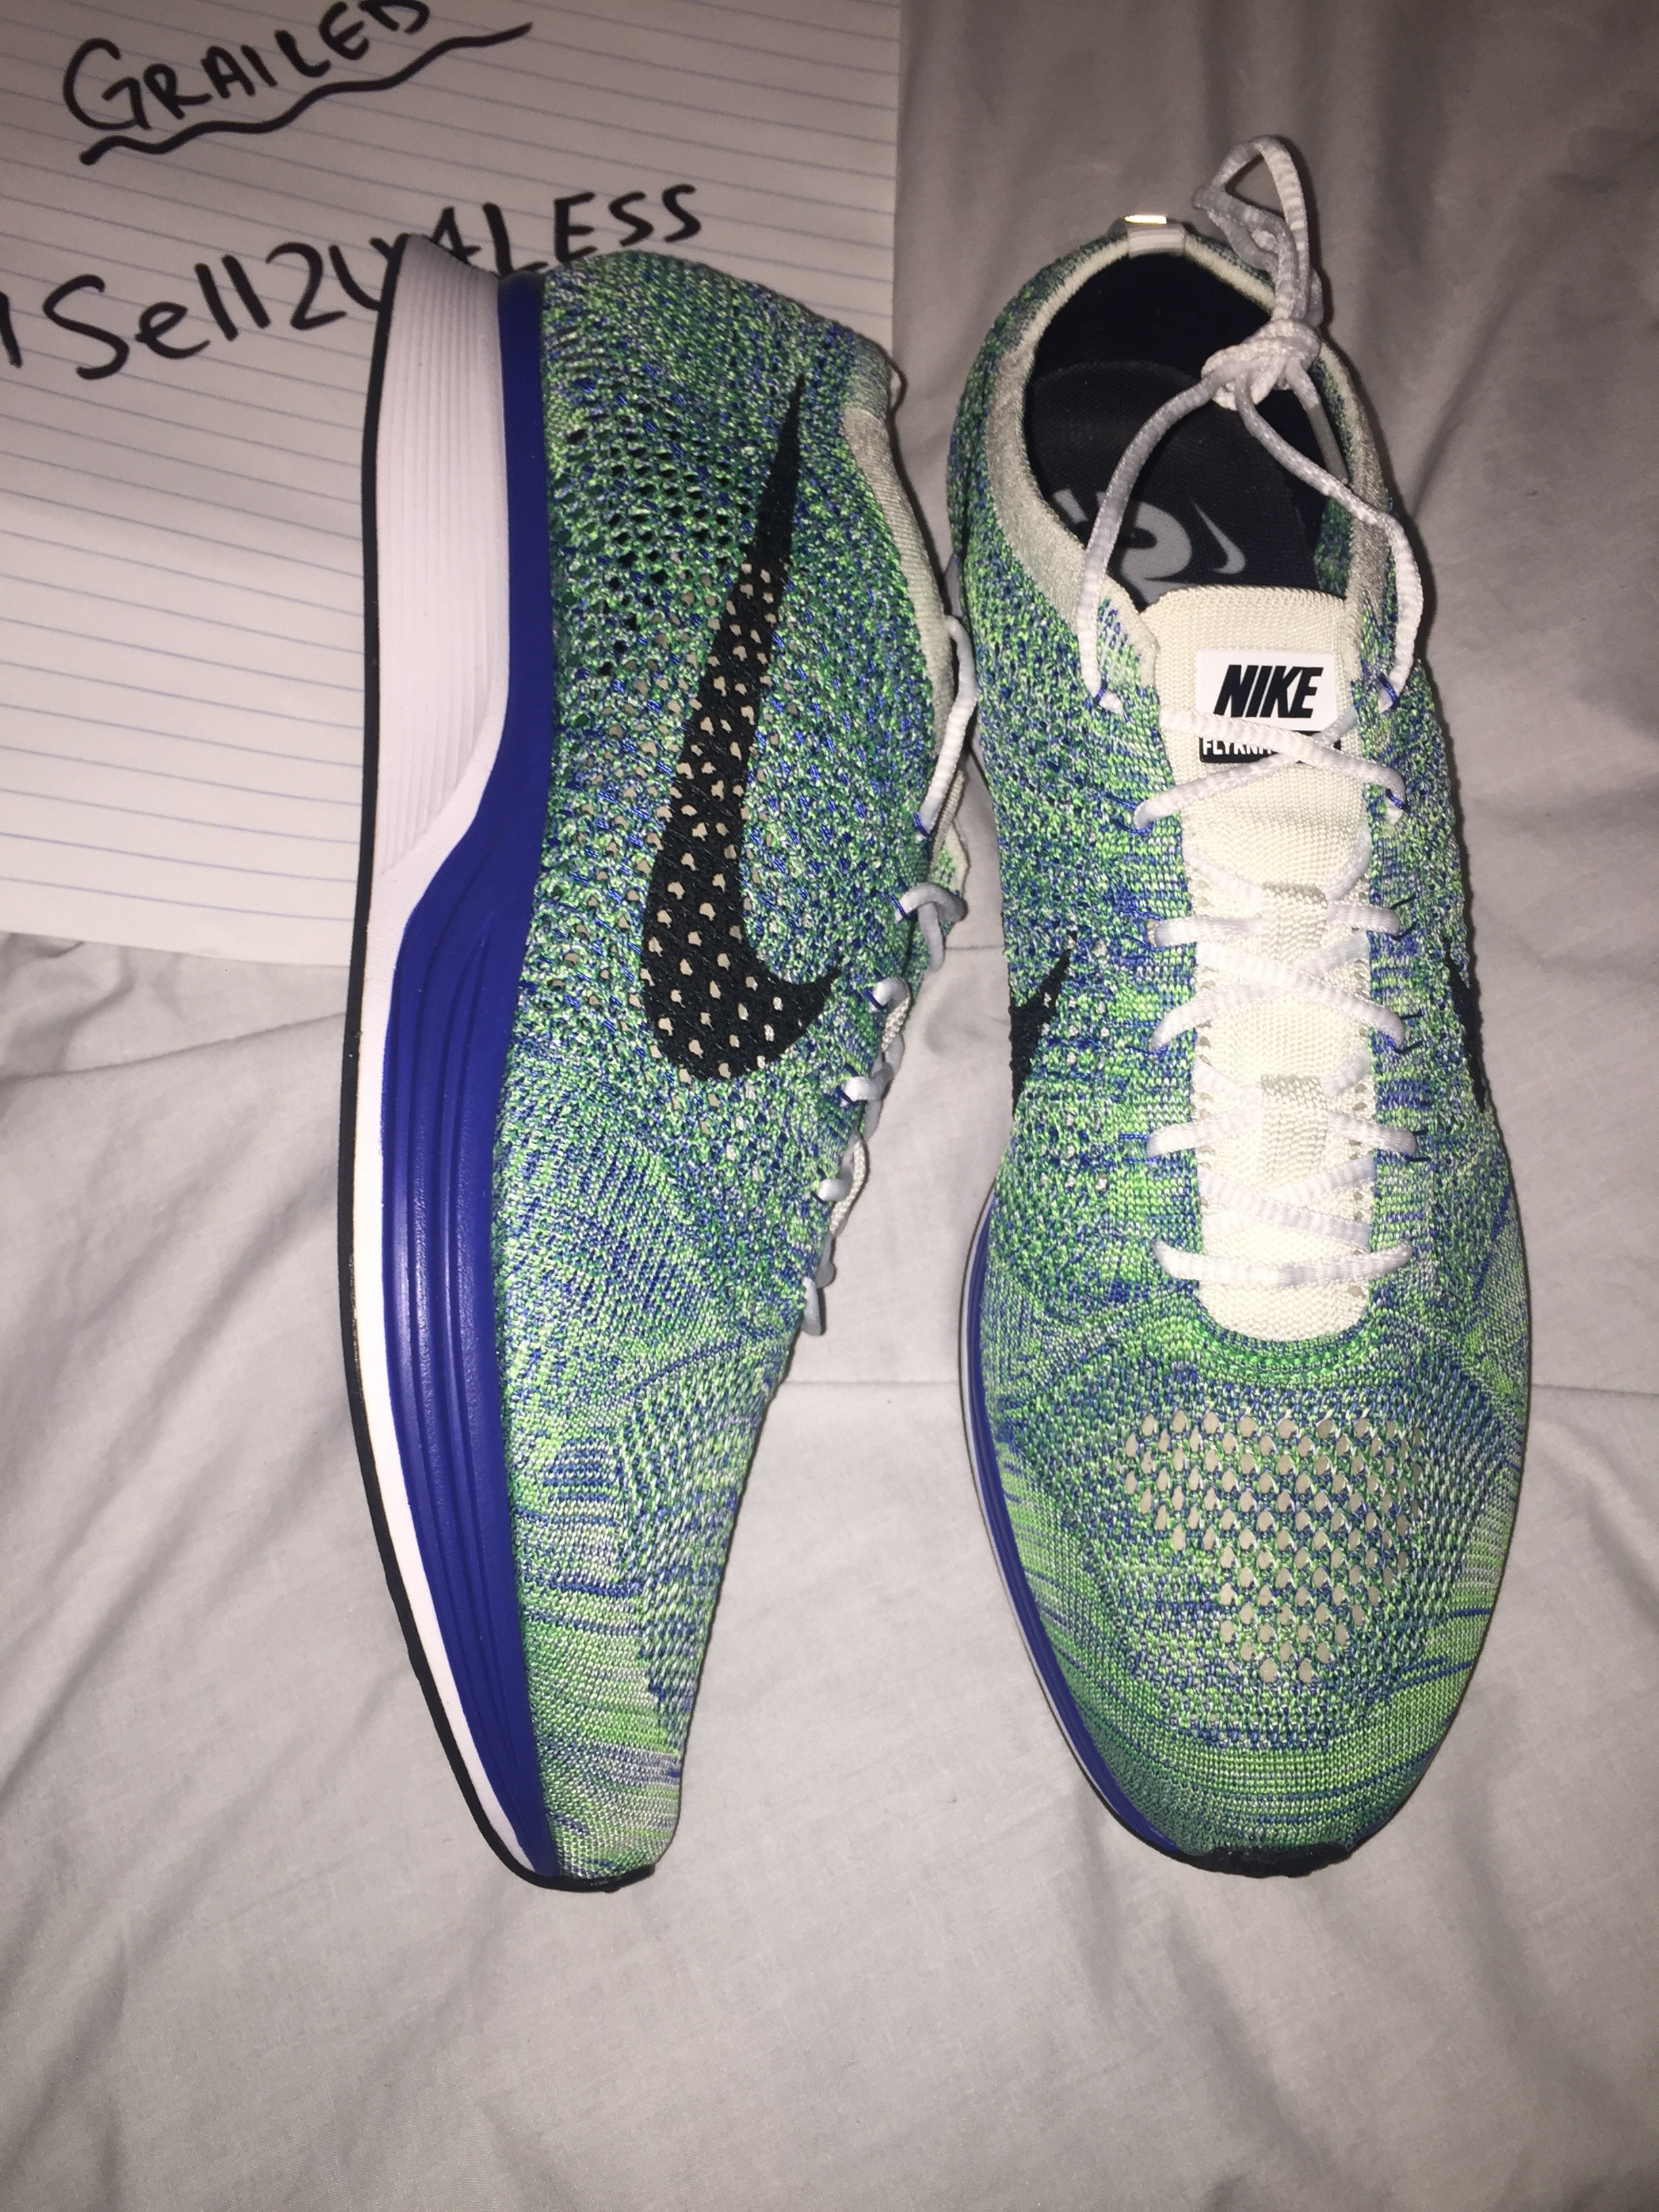 458ea58c9fadf Nike Nike Flyknit Racer Tranquil Green Blue White Unisex Running ...